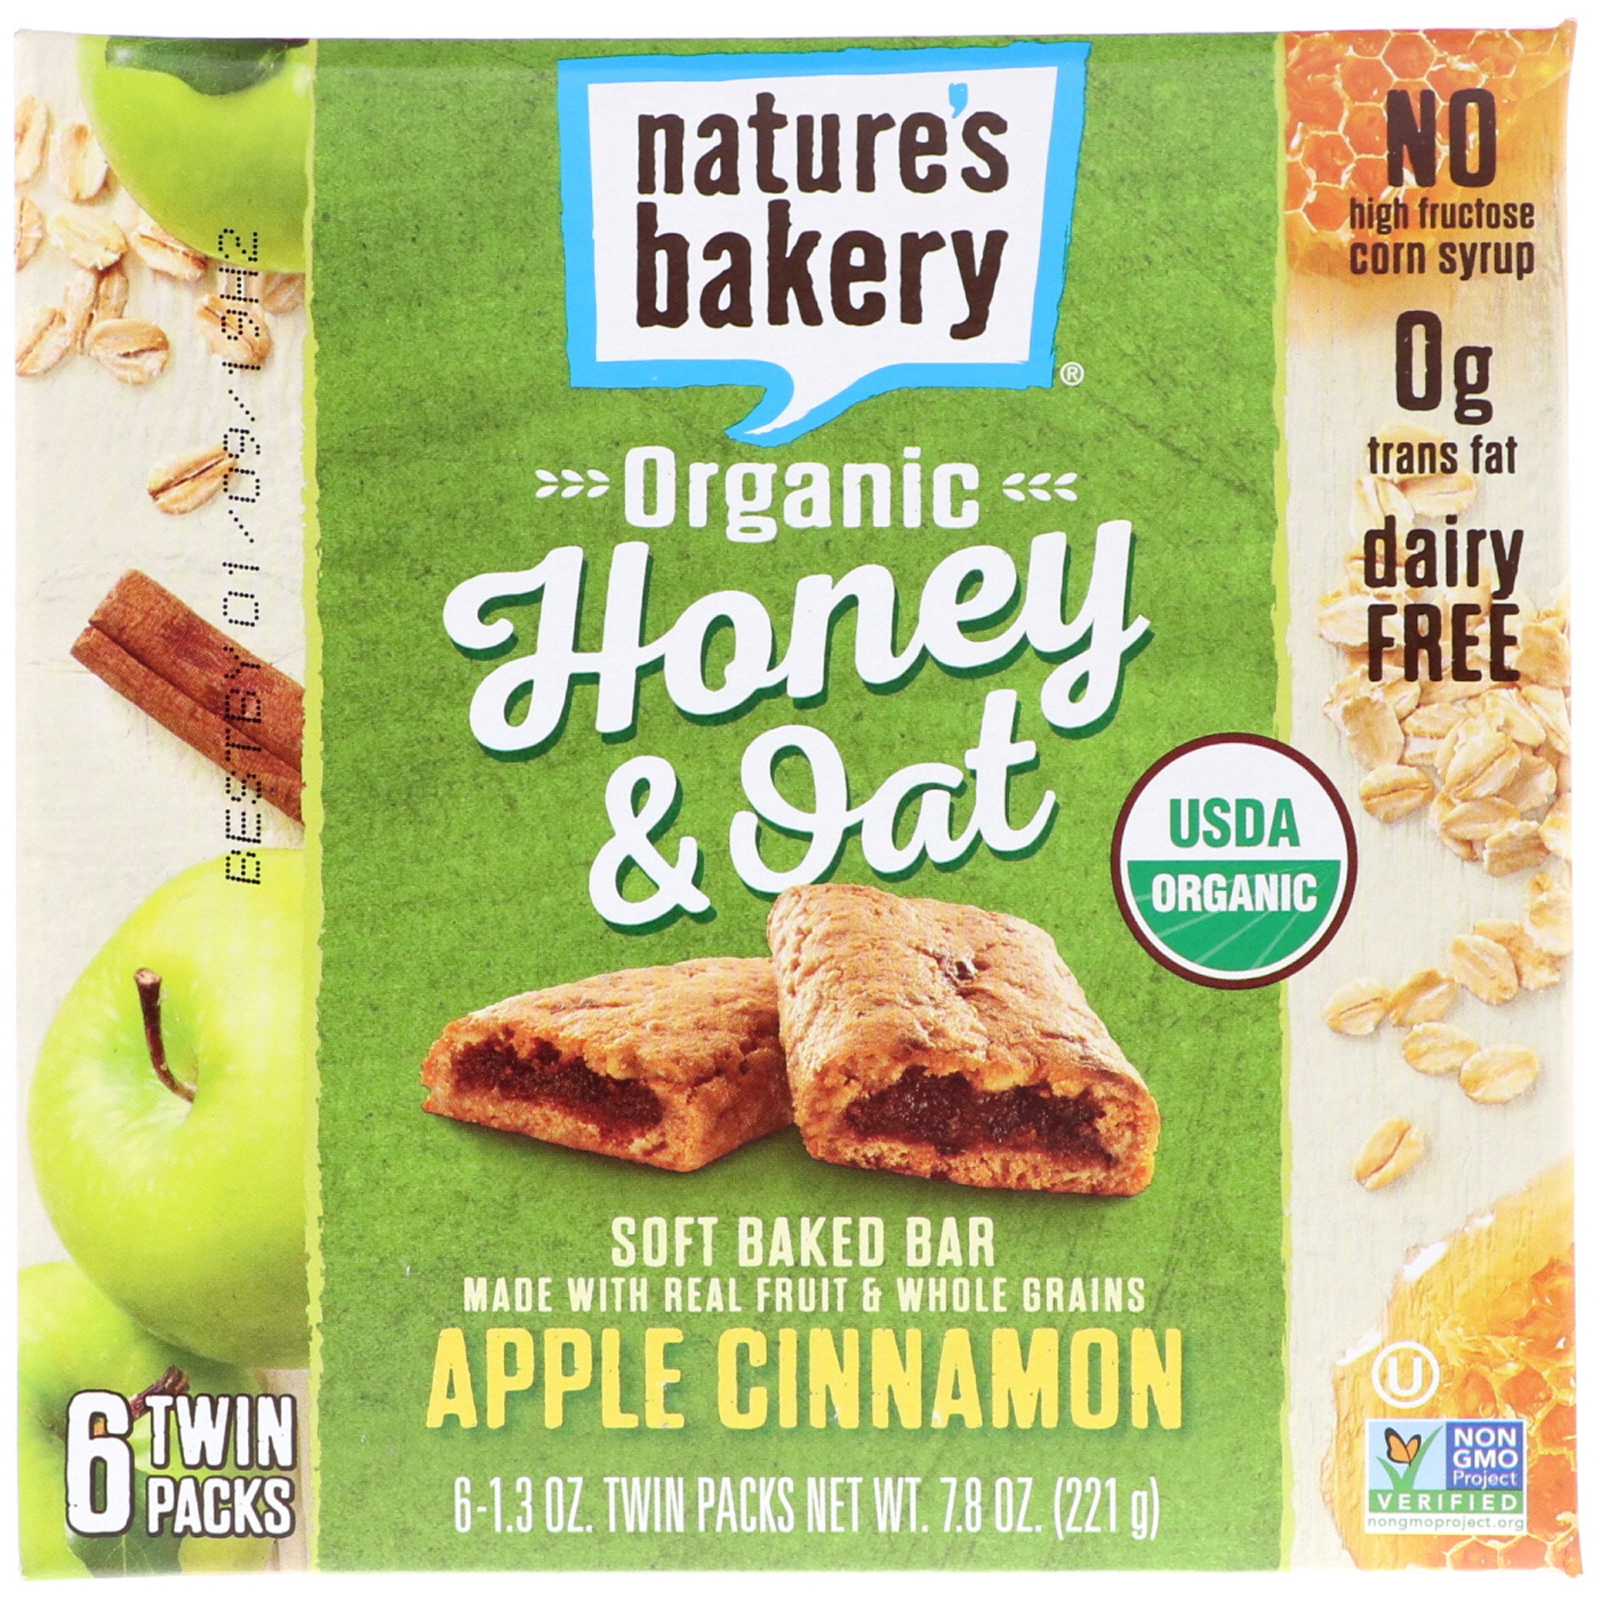 f00fdbe3338 Nature's Bakery, Organic Honey & Oat, Soft Baked Bar, Apple Cinnamon, 6  Twin Packs, 1.3 oz Each - iHerb.com